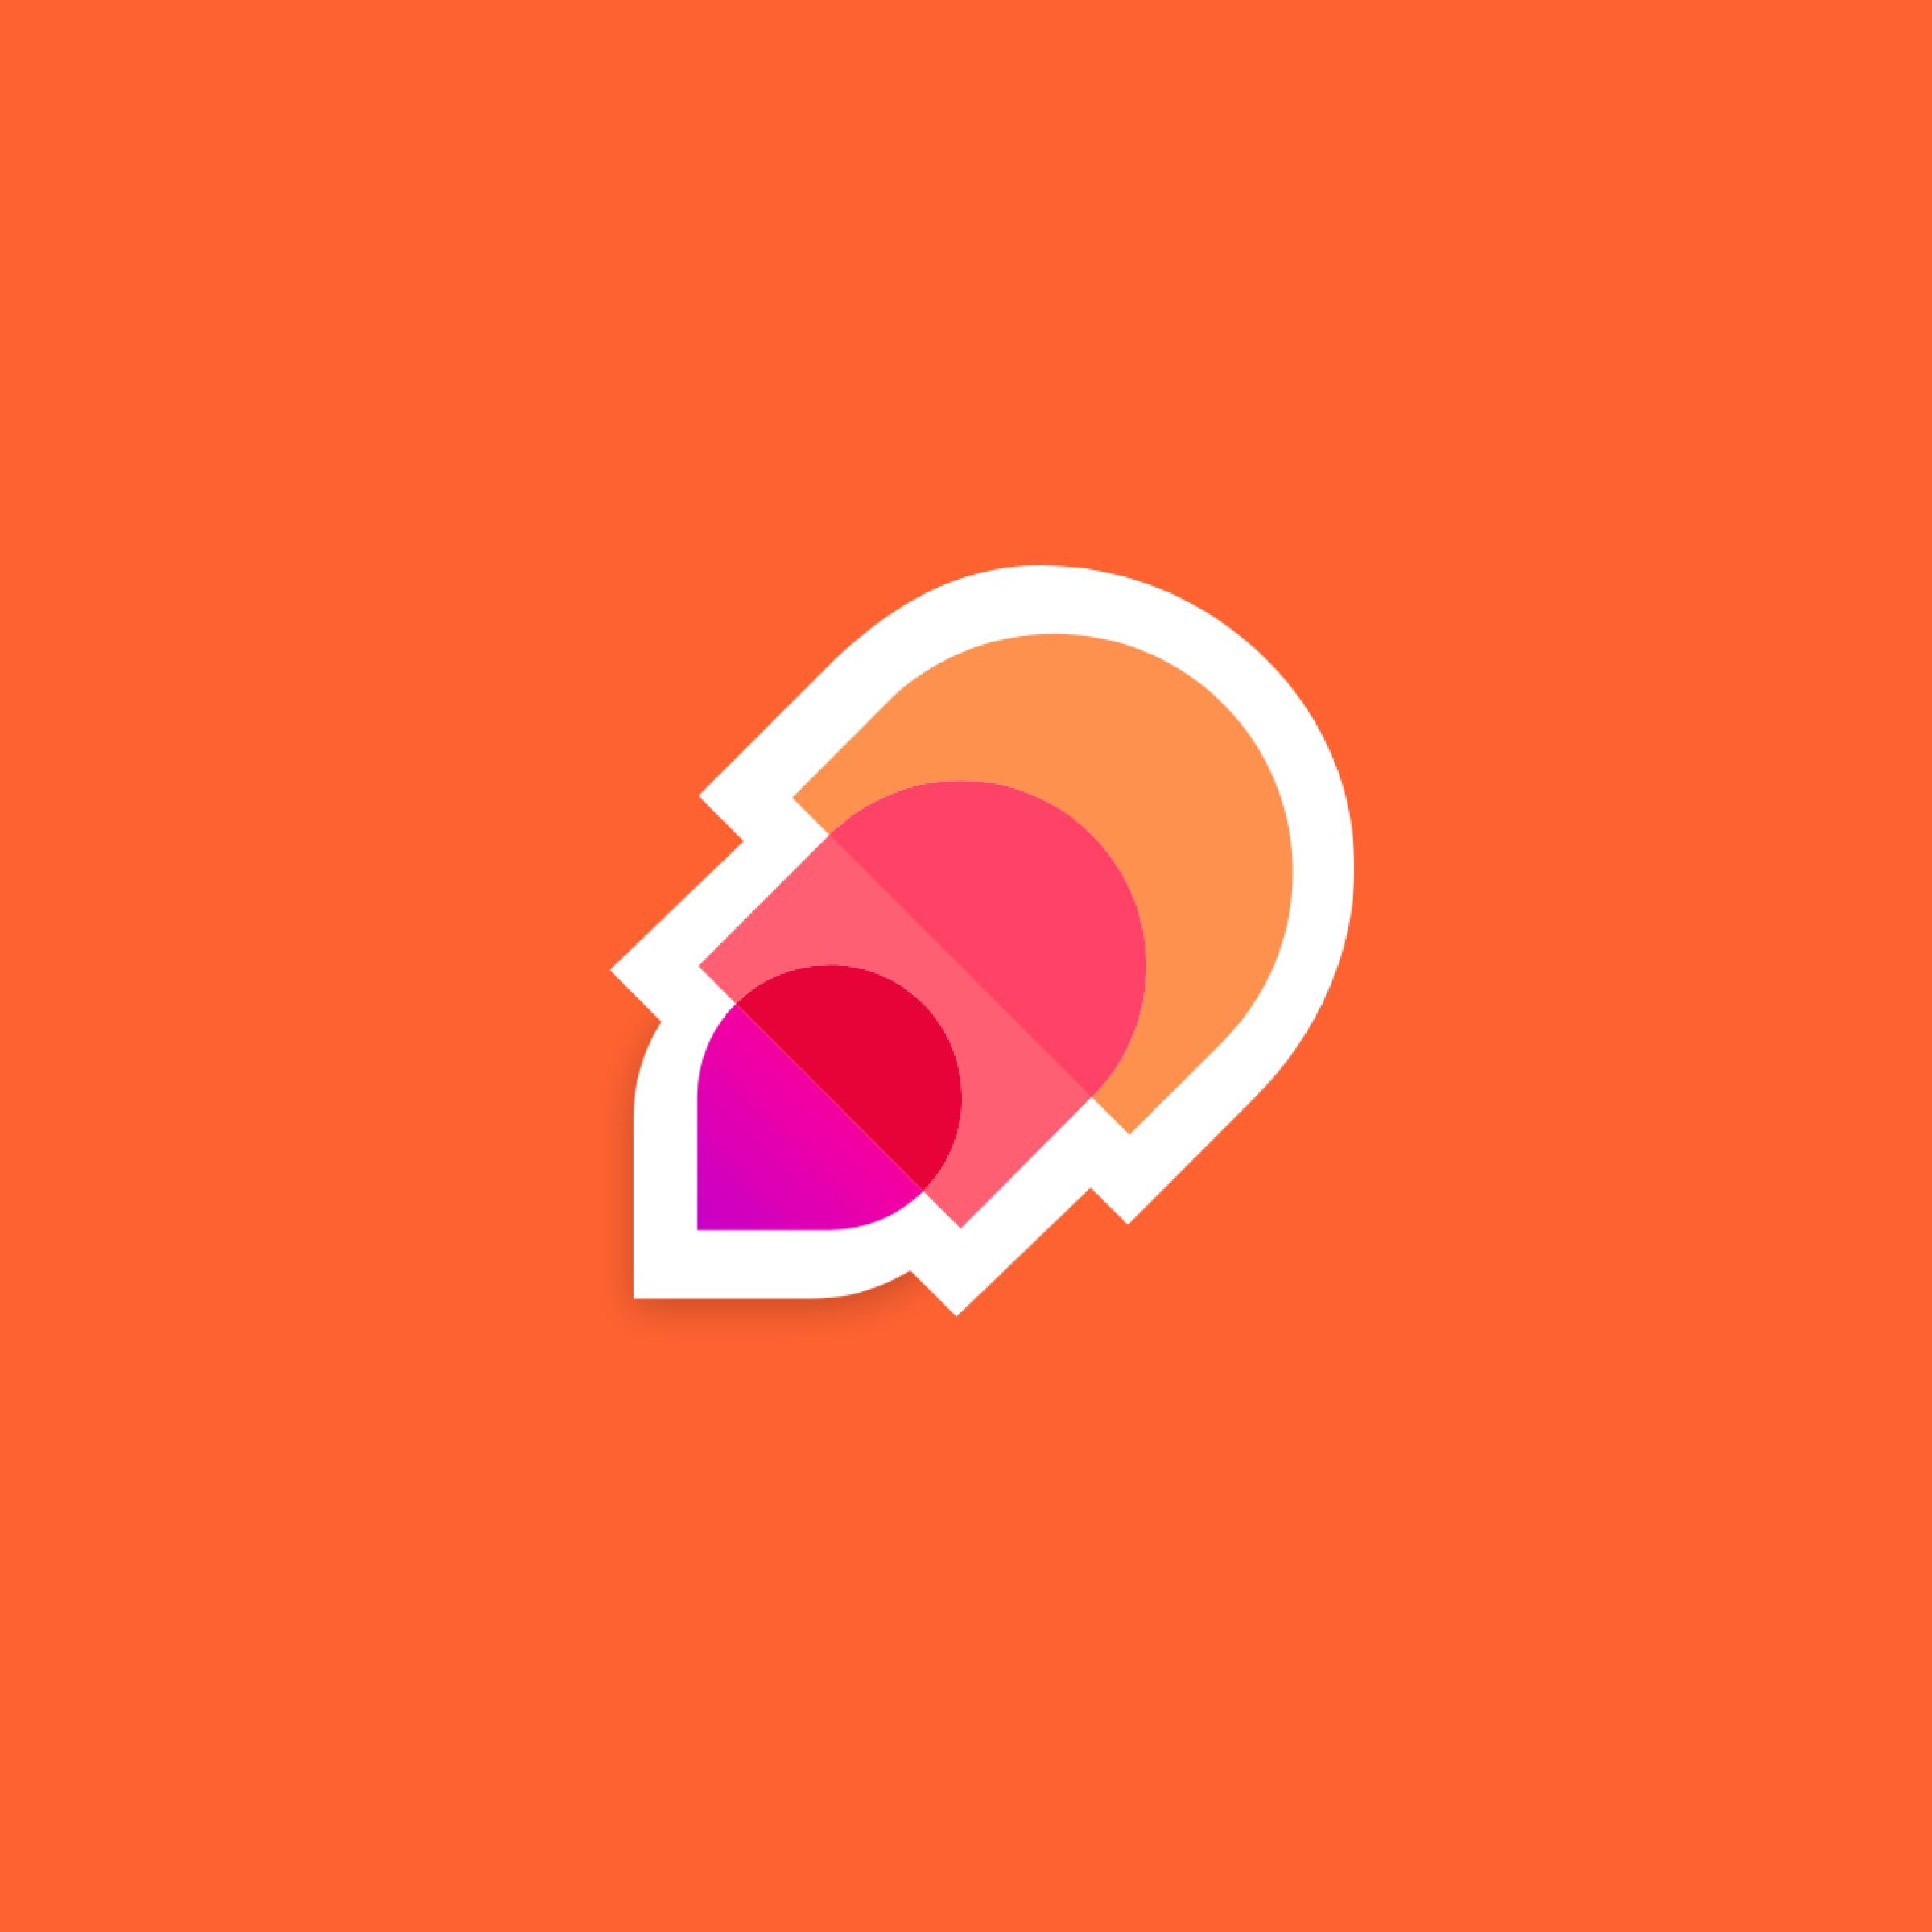 DroppX-logo neliönmuotoinen logo